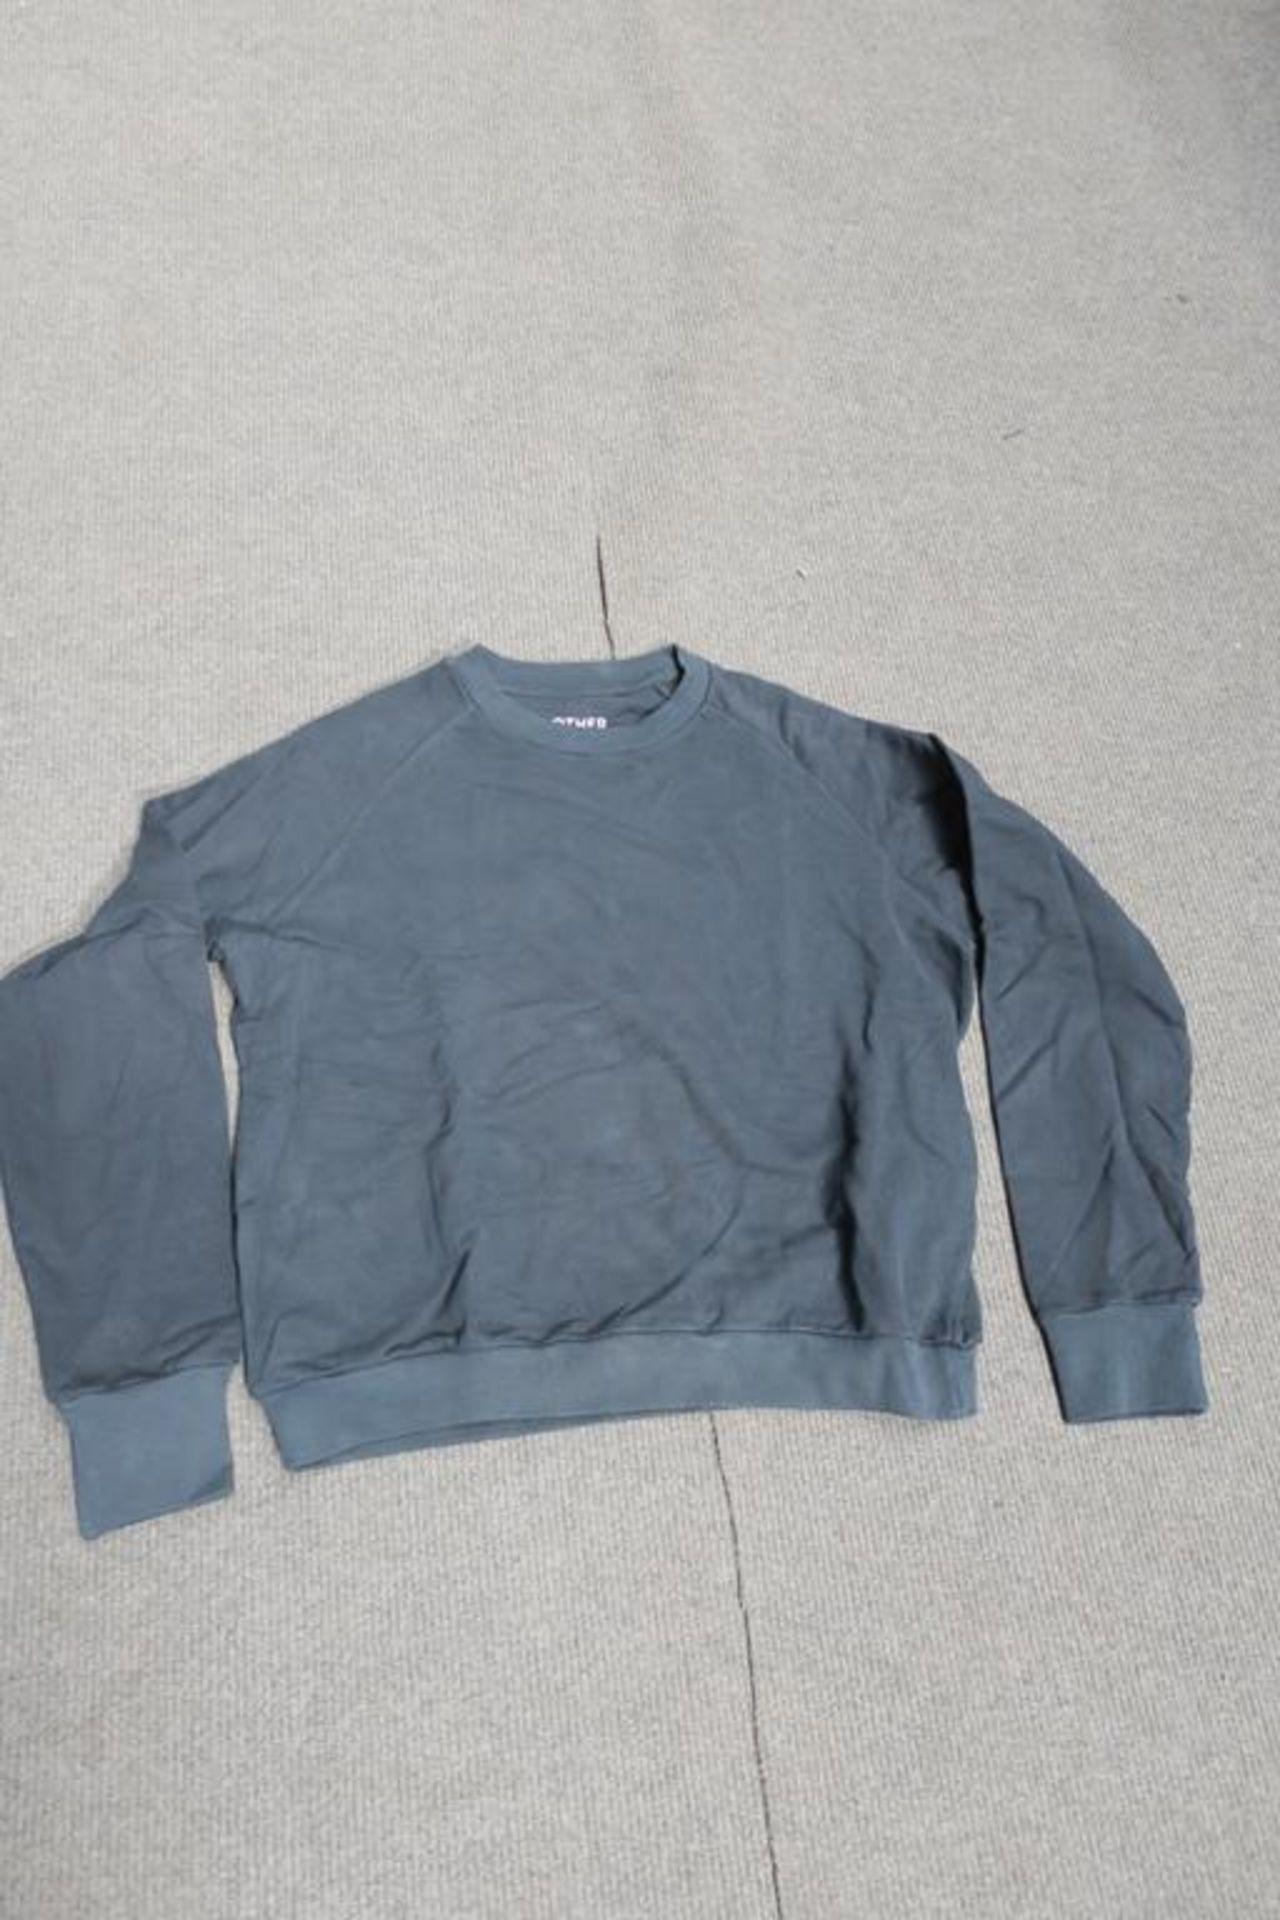 Lot 758 - 8 Other Ragian Sweatshirts Black Long Sleeved, Sizes - 4 x Large, 1 x Medium, 2 x Small and 1 x XSma